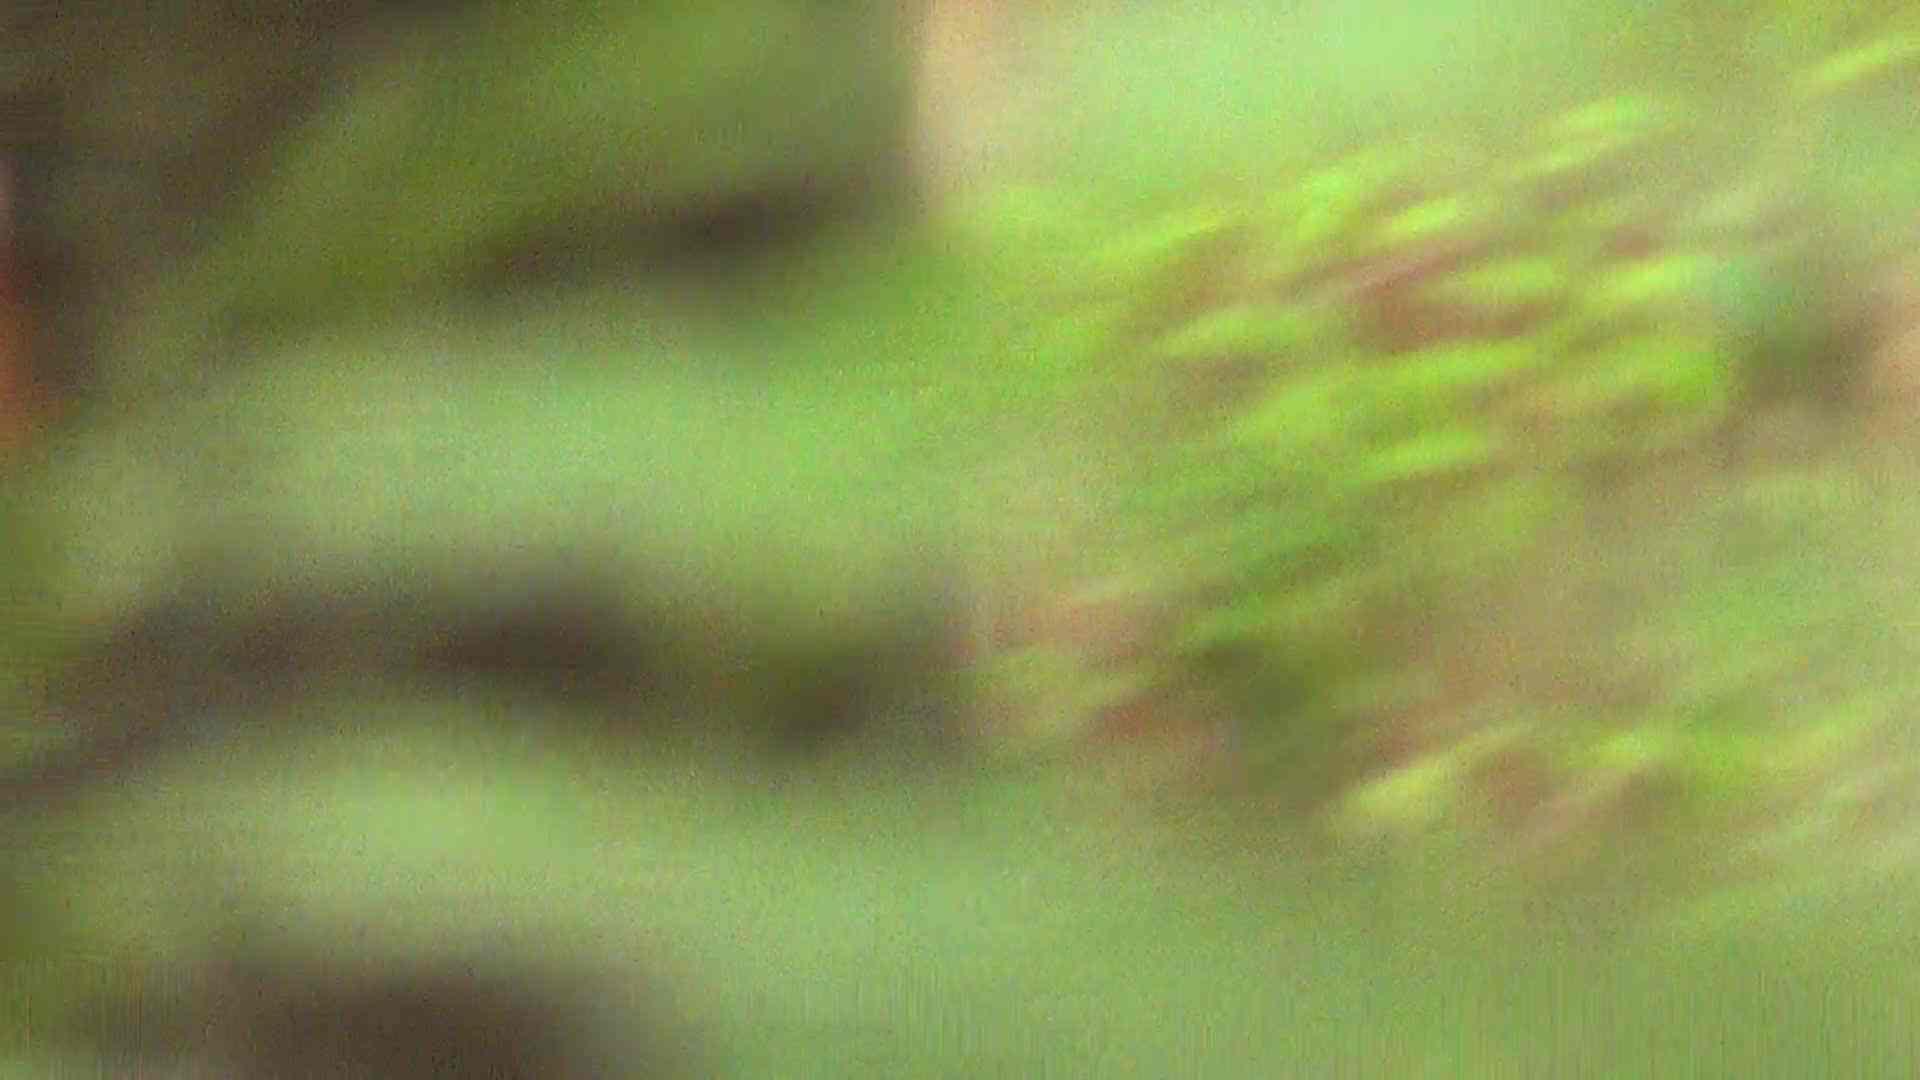 Aquaな露天風呂Vol.247 露天風呂編 | 盗撮シリーズ  87PIX 63